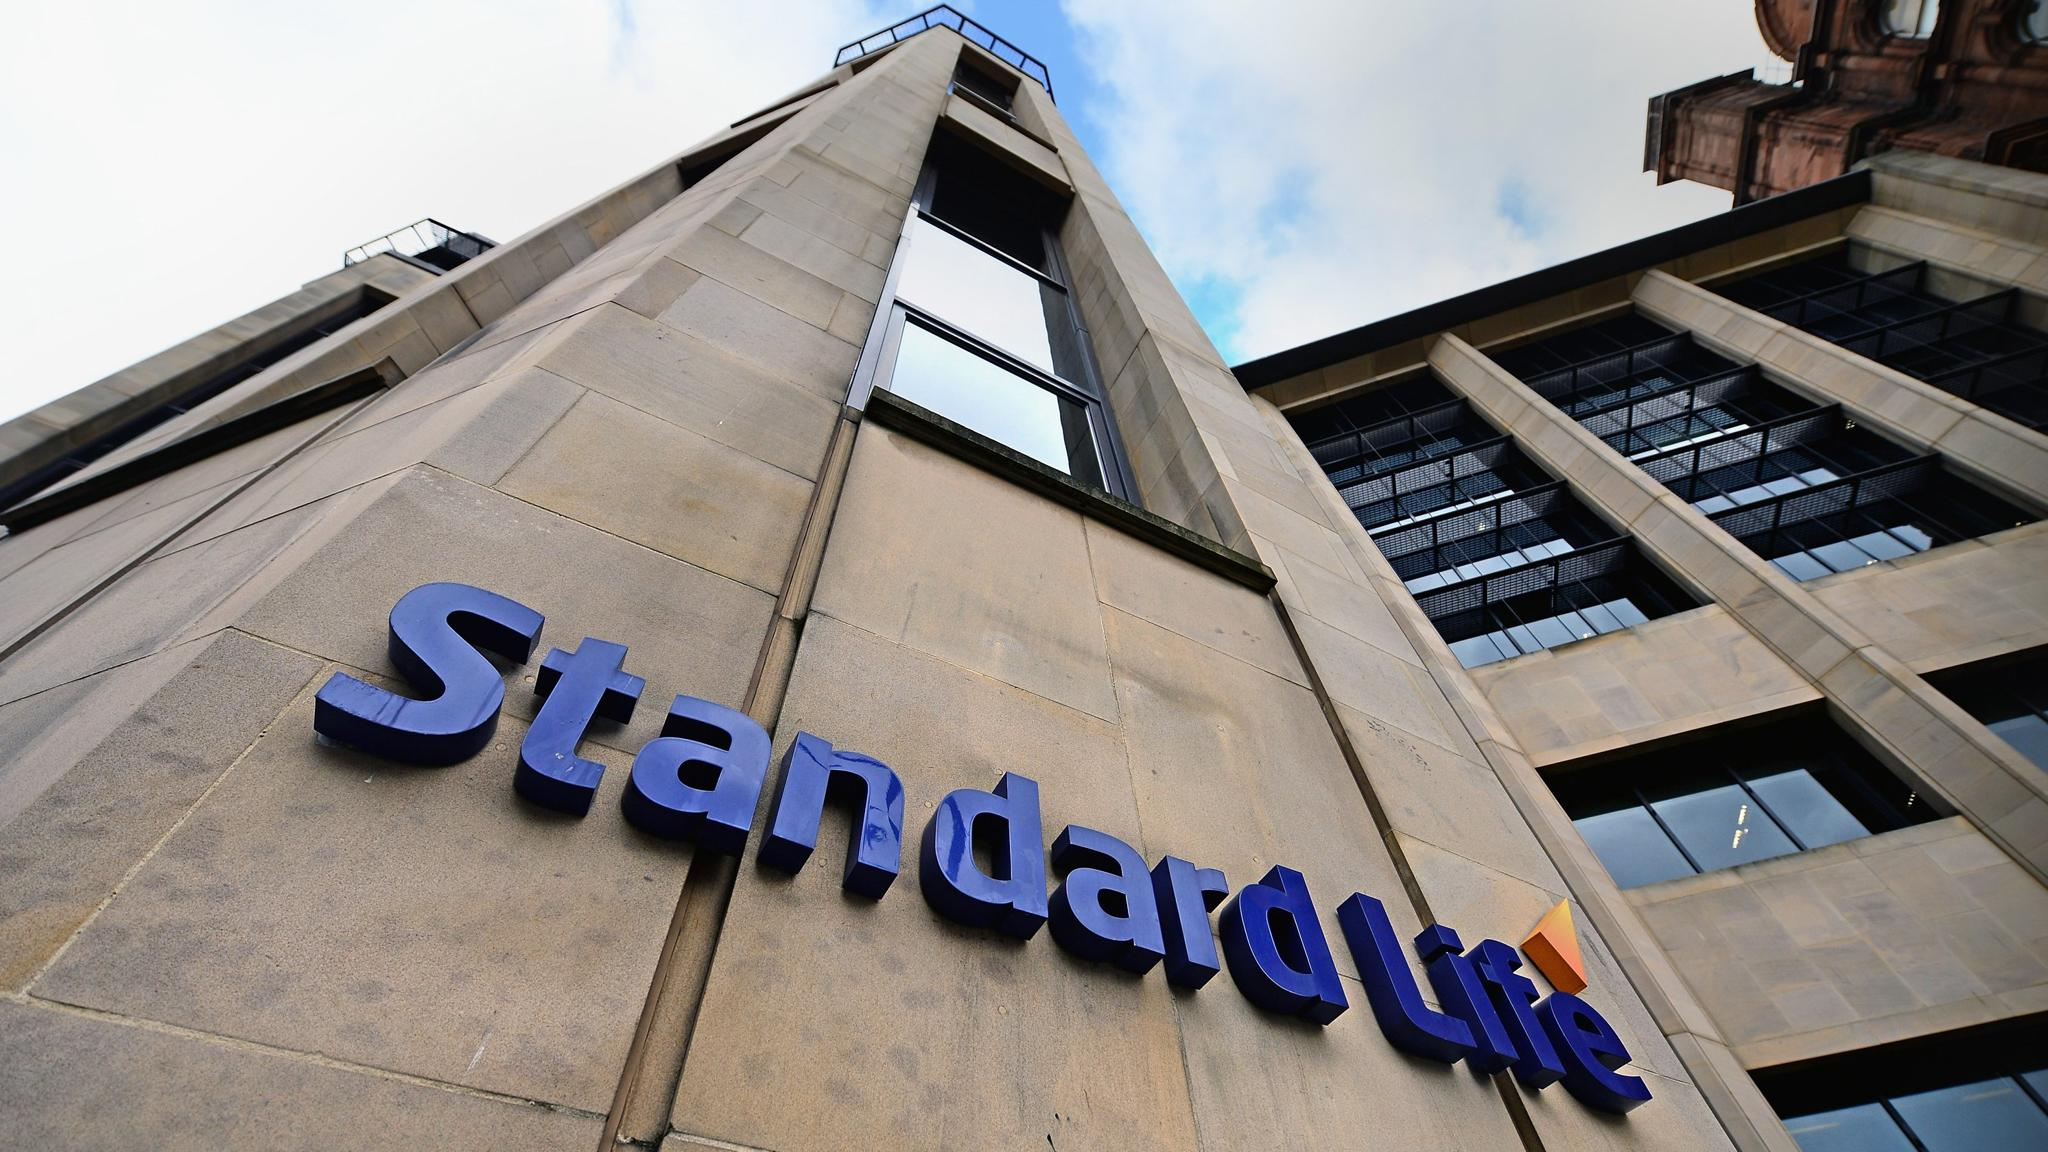 Standard life investments global ii - Standard Life Investments Global Ii 30